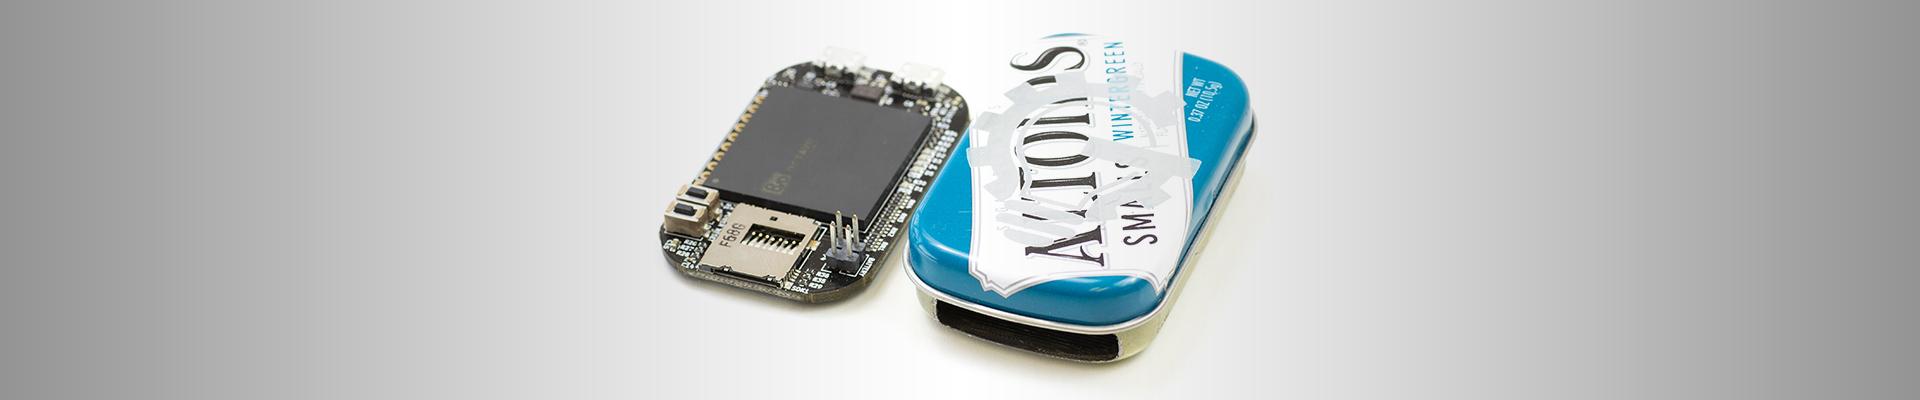 PocketBone